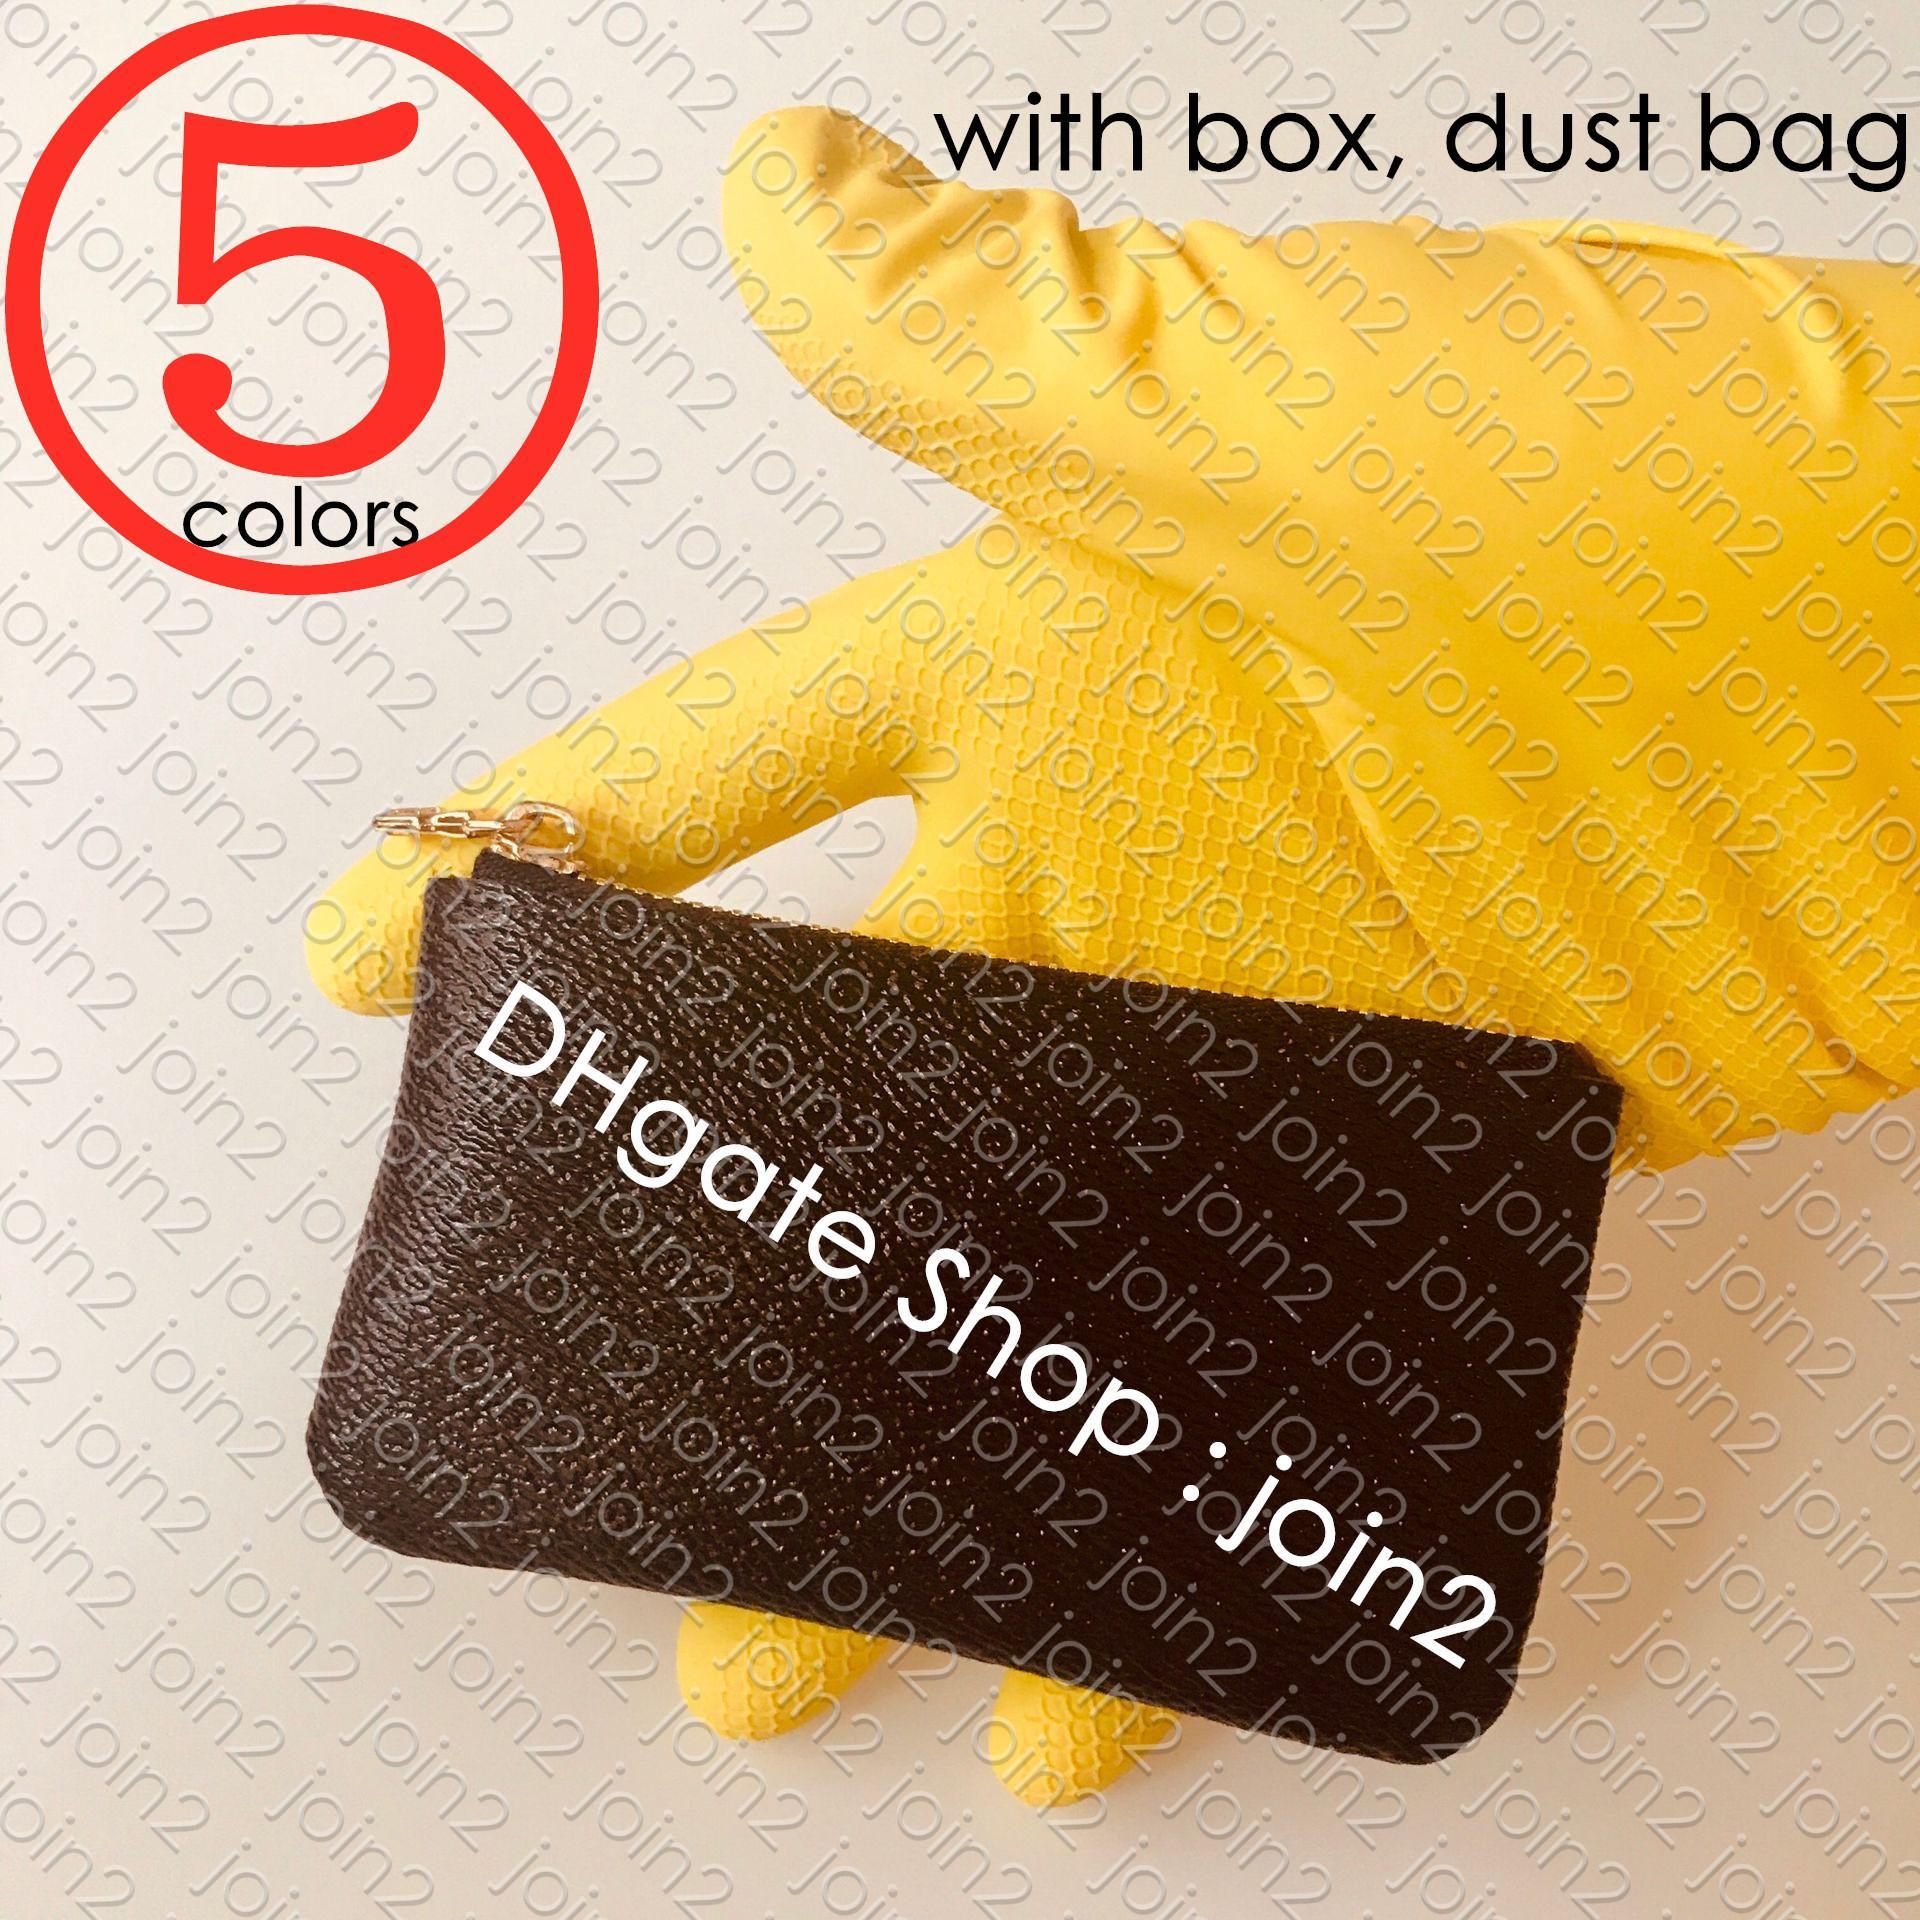 M62650 KEY POUCH POCHETTE CLES Designer Womens Mens Change Key Ring Credit Card Holder Coin Purse Mini Wallet Bag Charm Pochette Accessories